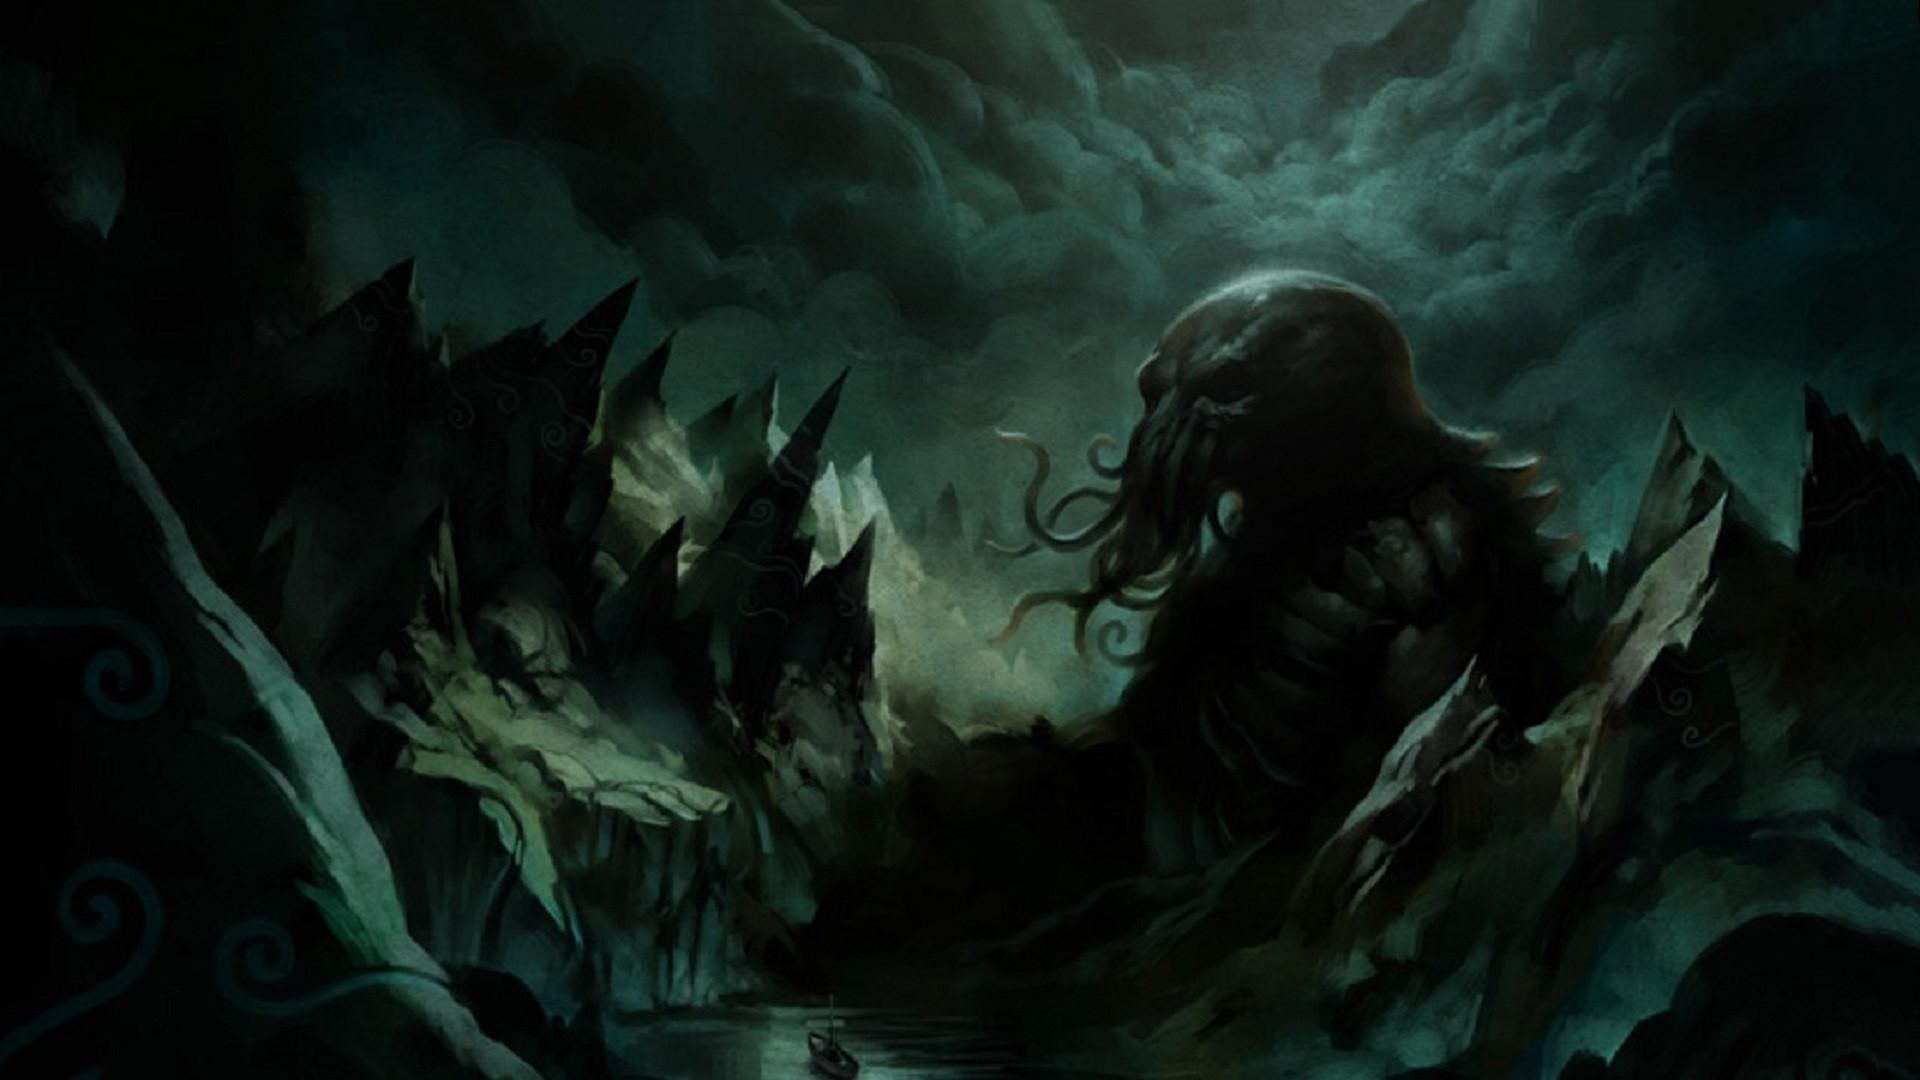 Hd Cthulhu Wallpaper Cthulhu Lovecraft Cthulhu Lovecraftian Horror